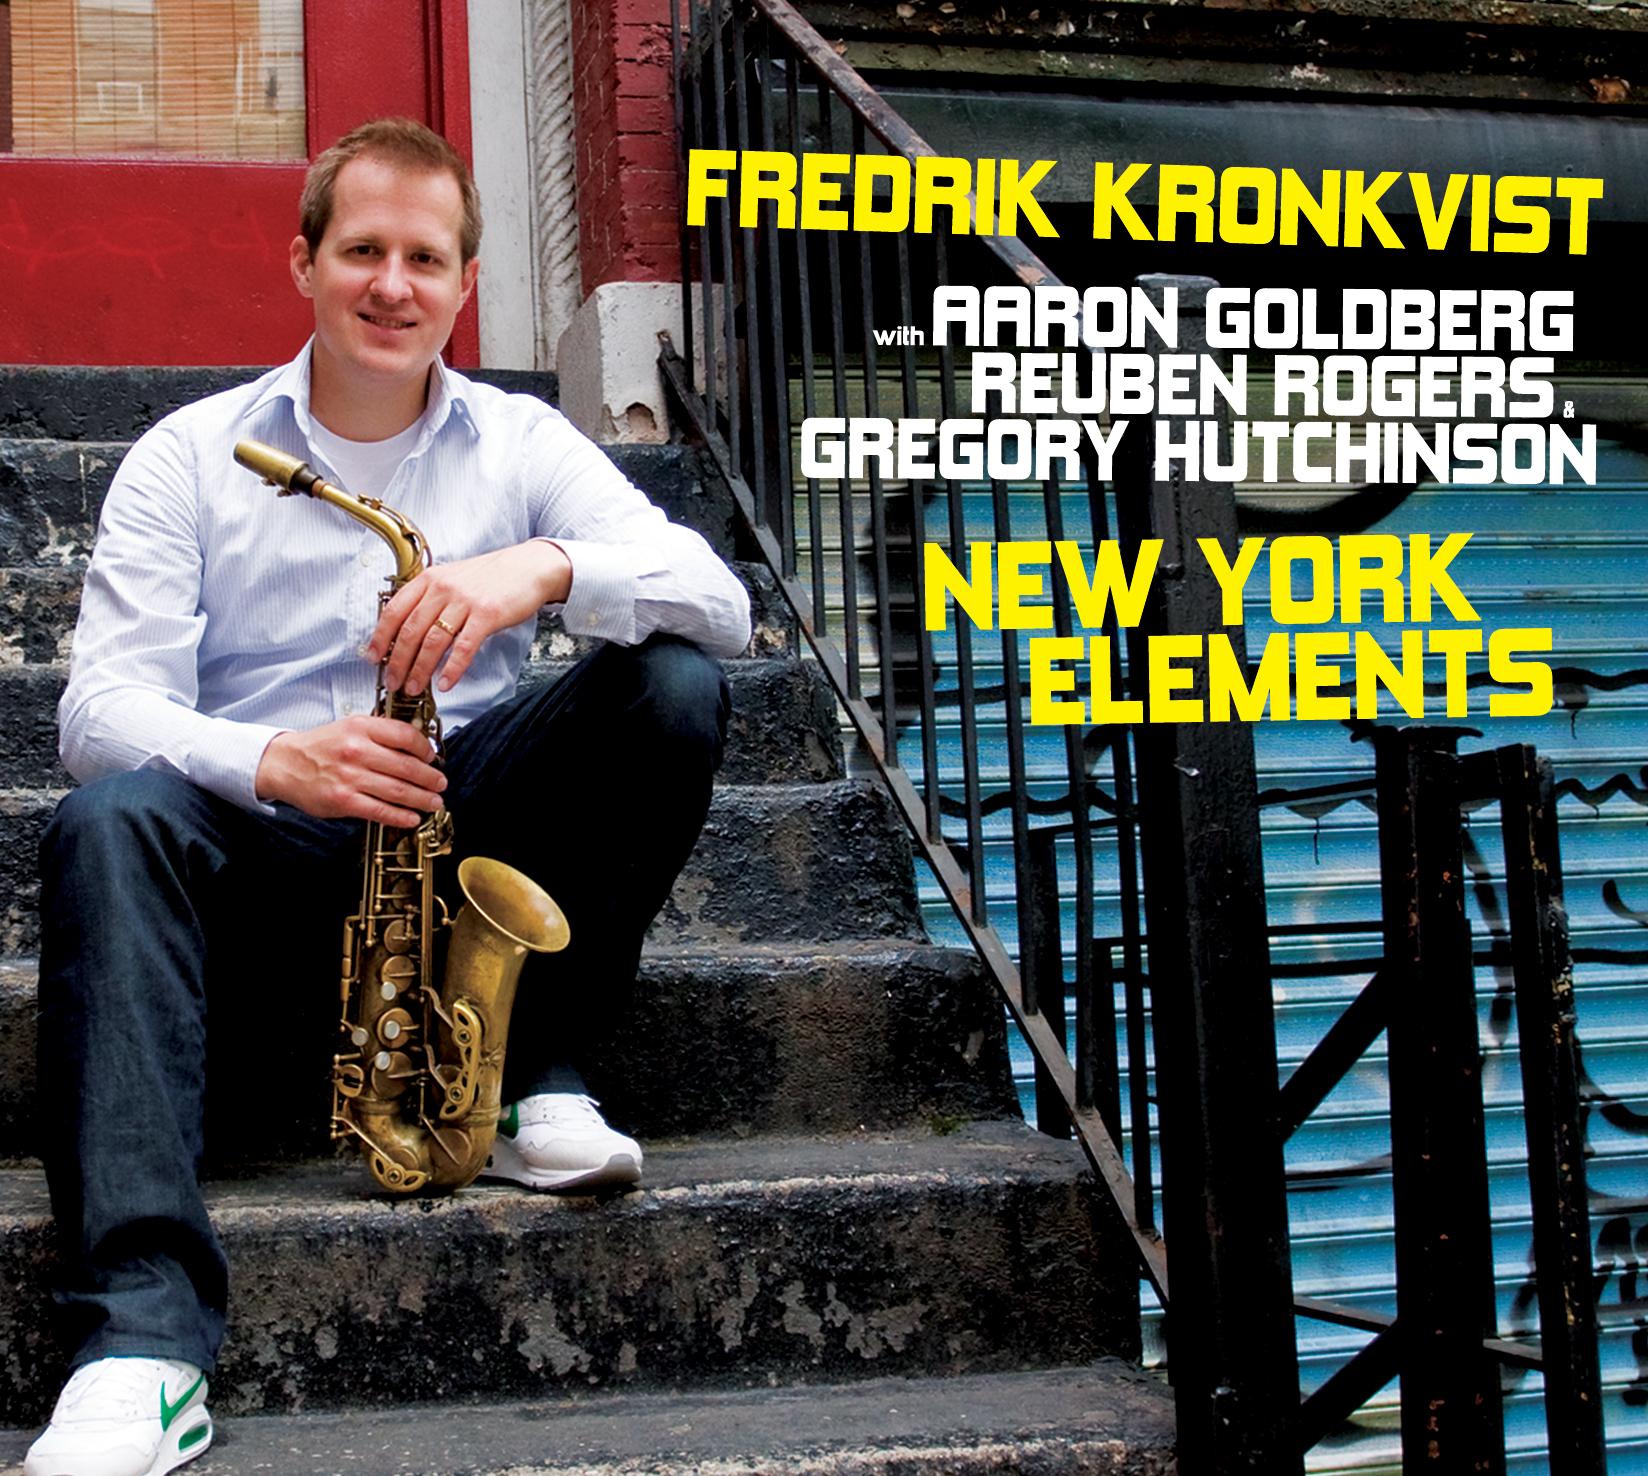 Fredrik kronkvist on the move